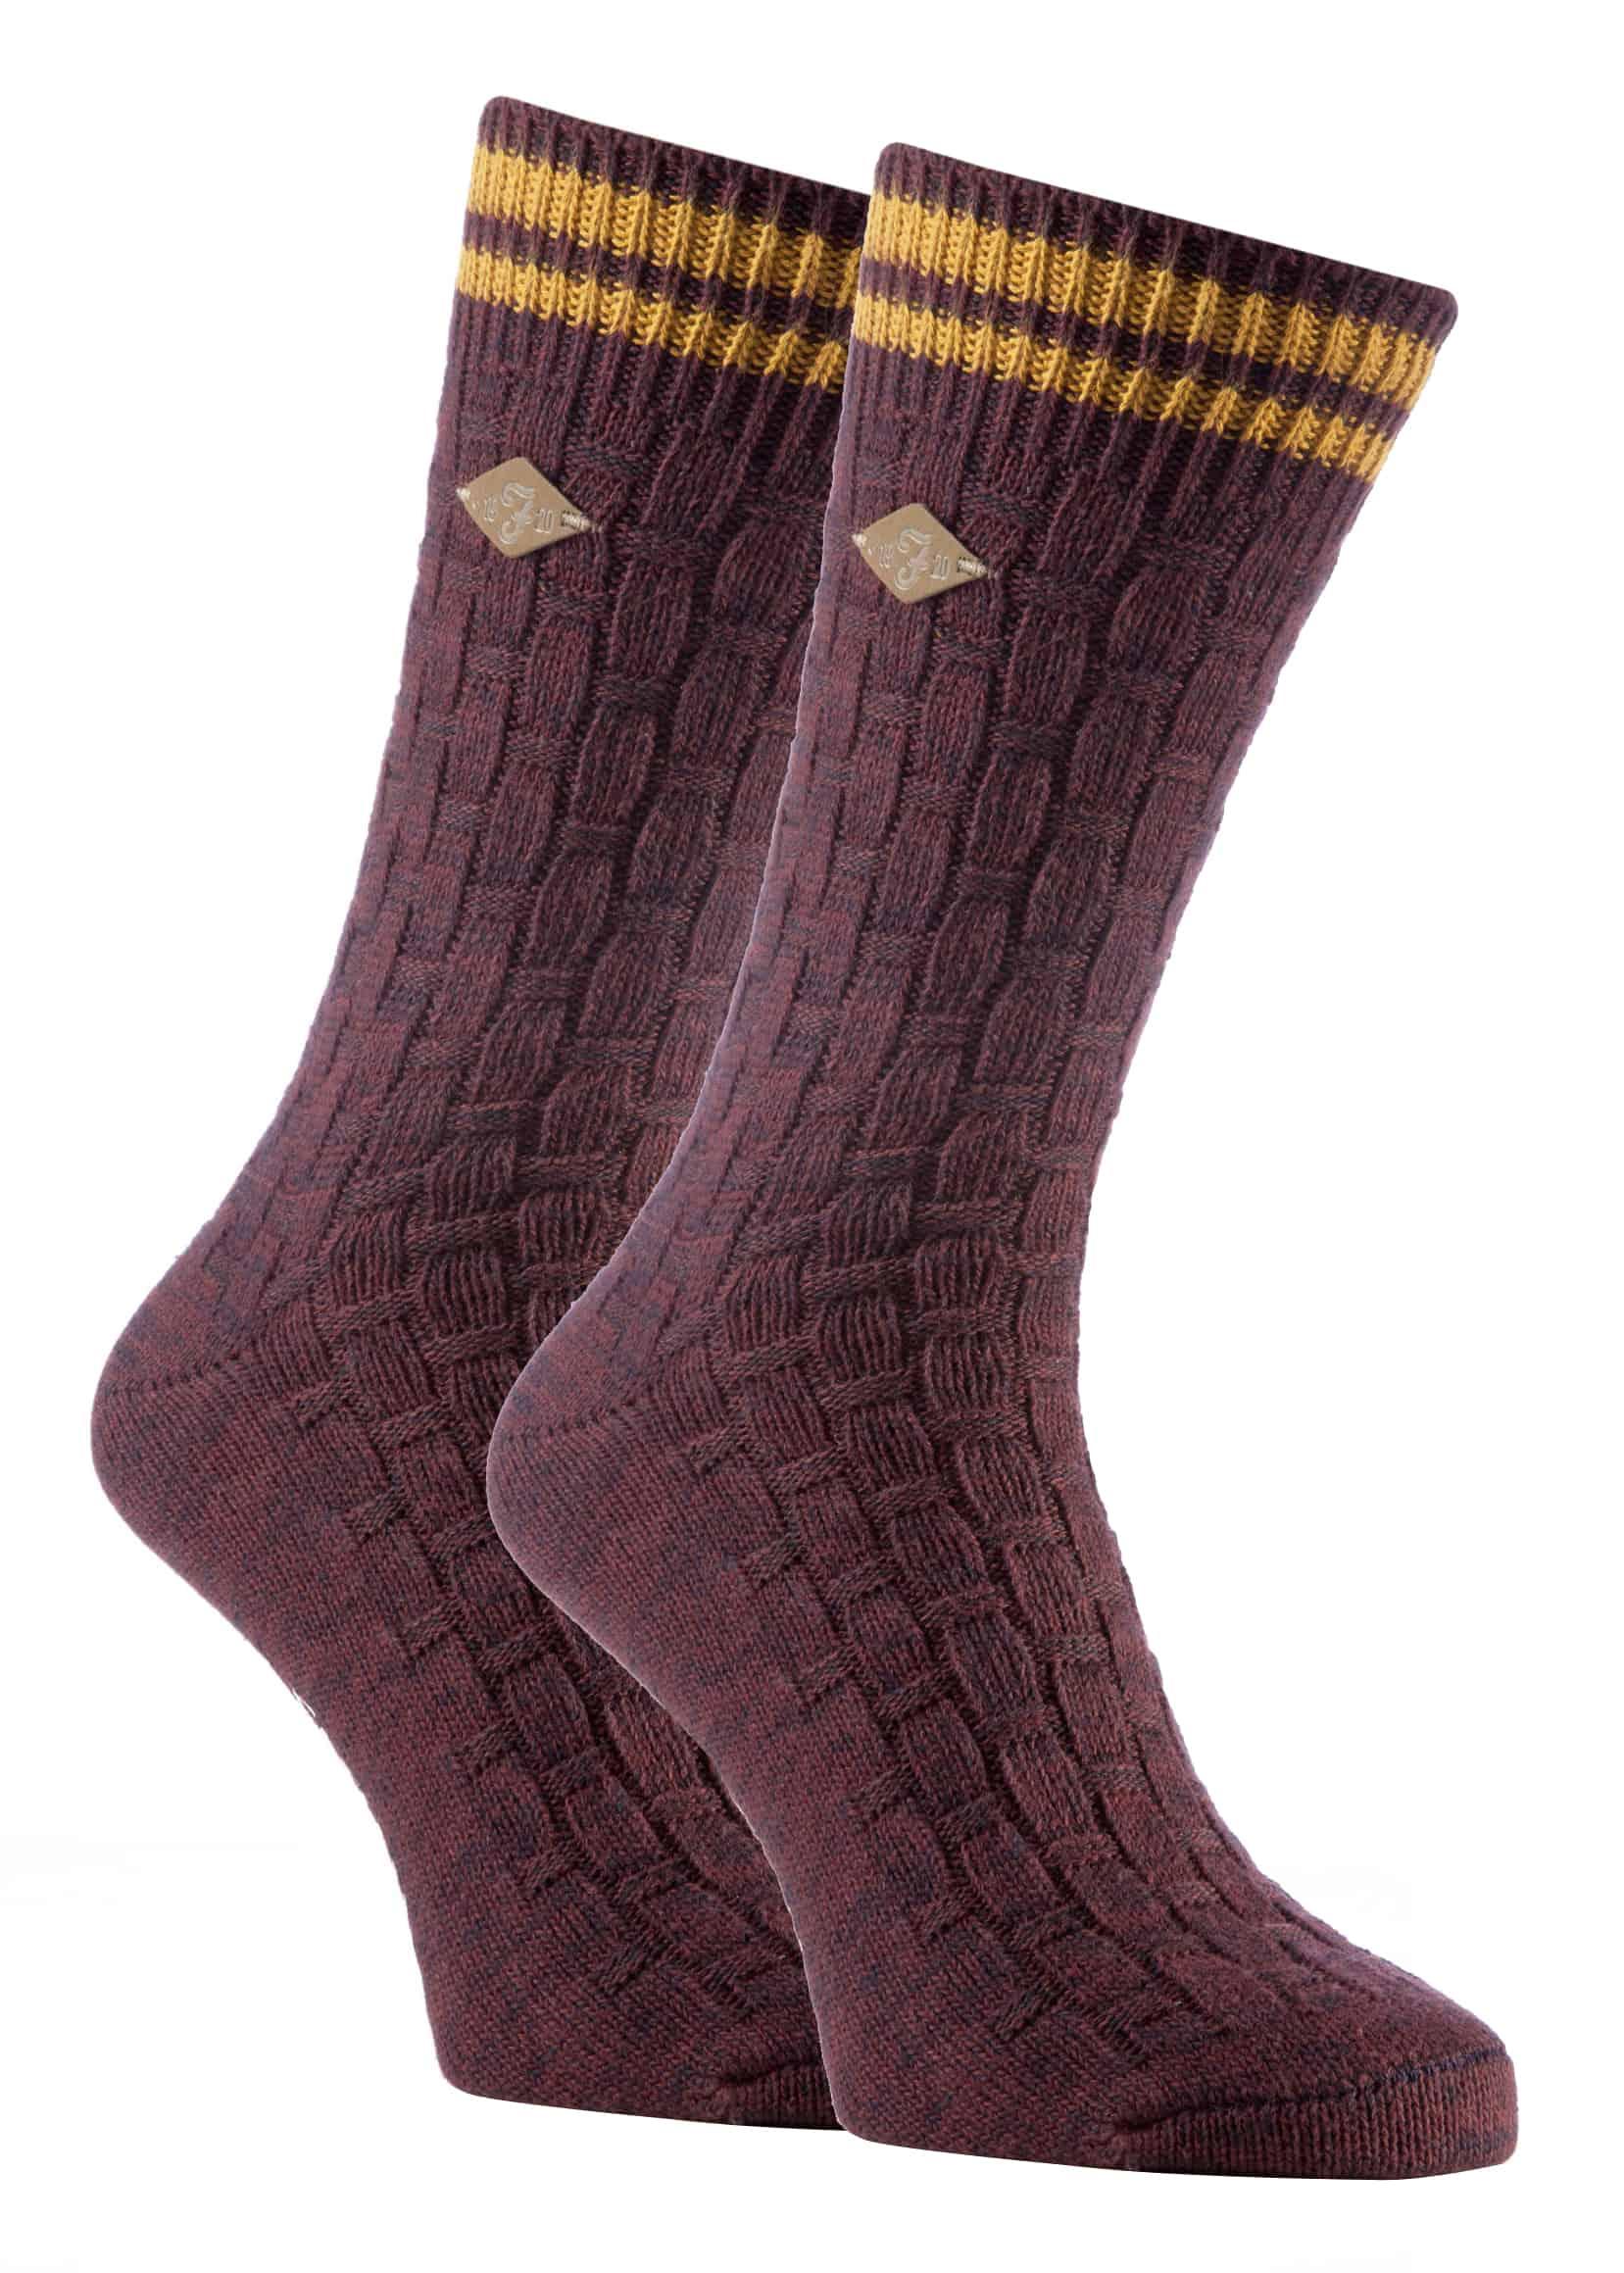 3 Pairs Of Mens Non Elastic Wool Socks Thick Chunky Work Boot Socks 6-11